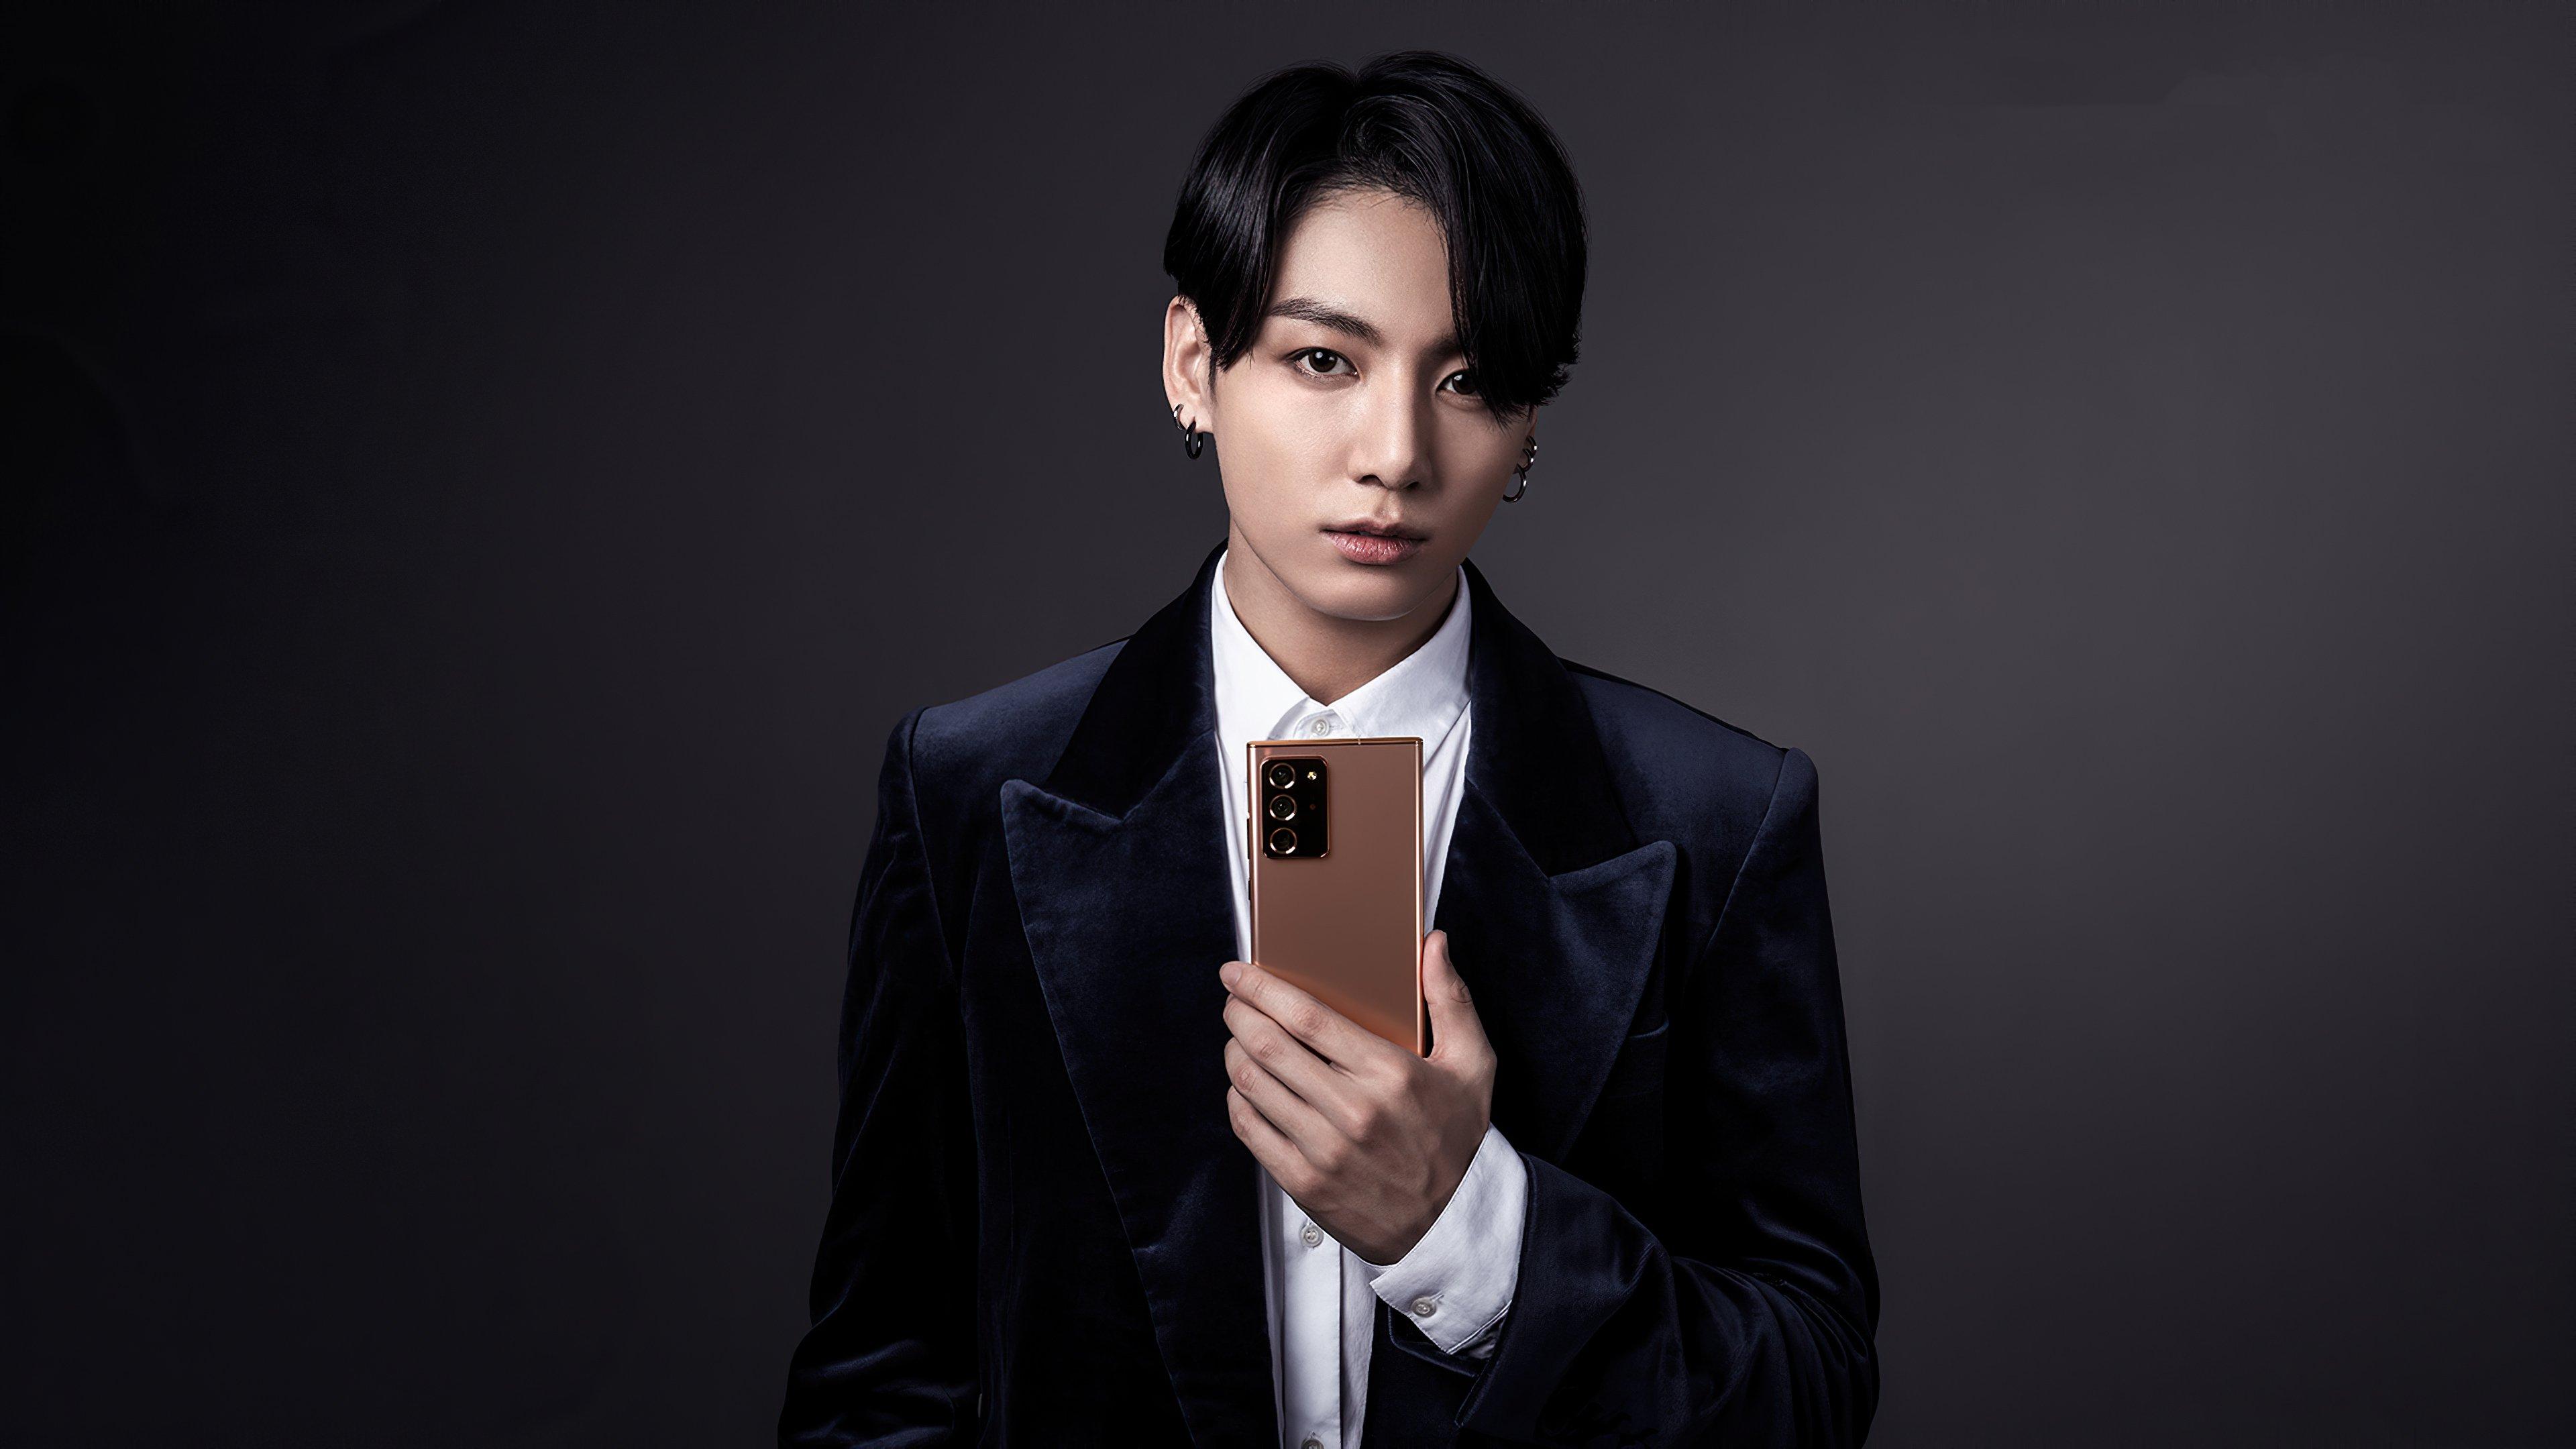 Fondos de pantalla Jungkook de BTS para Sanmsung